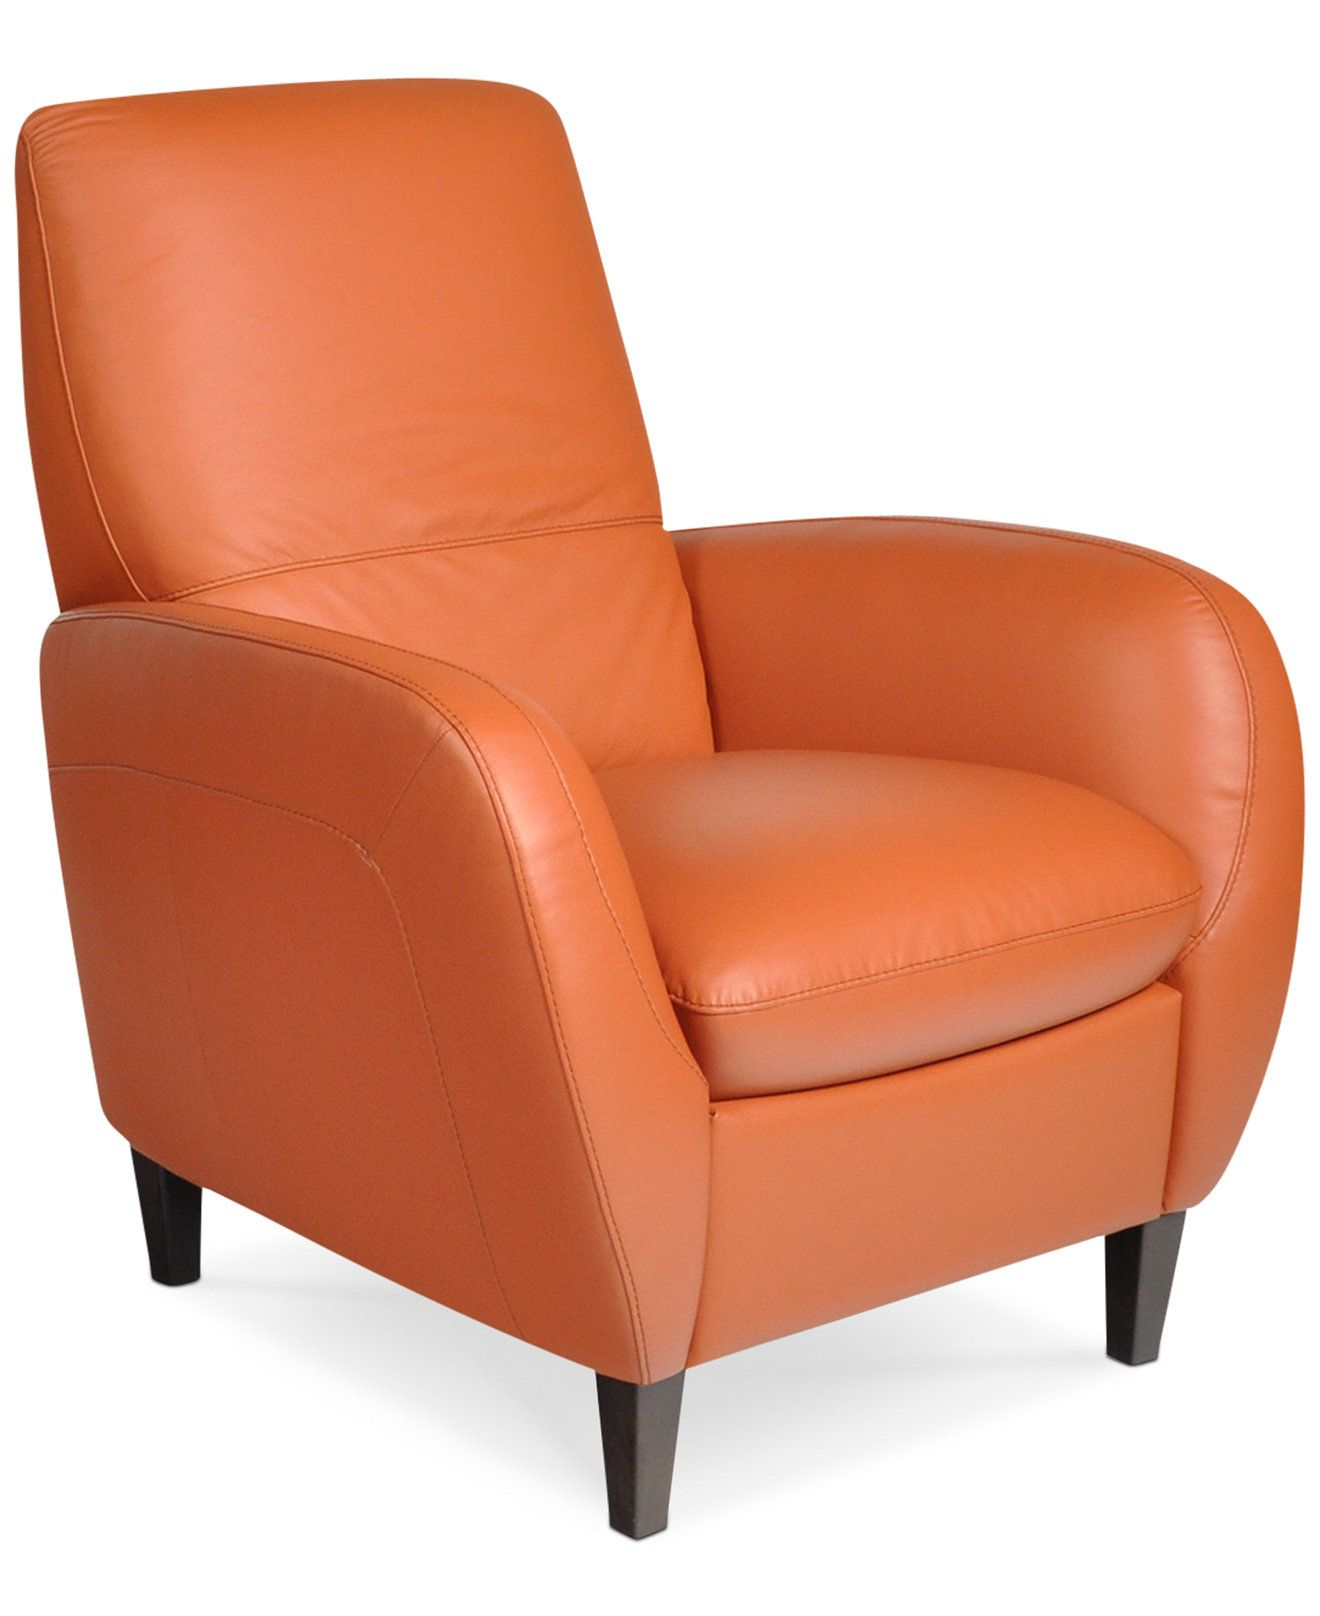 Phenomenal Comes In Dark Brown Aubrey Leather Recliner Chair Chairs Creativecarmelina Interior Chair Design Creativecarmelinacom